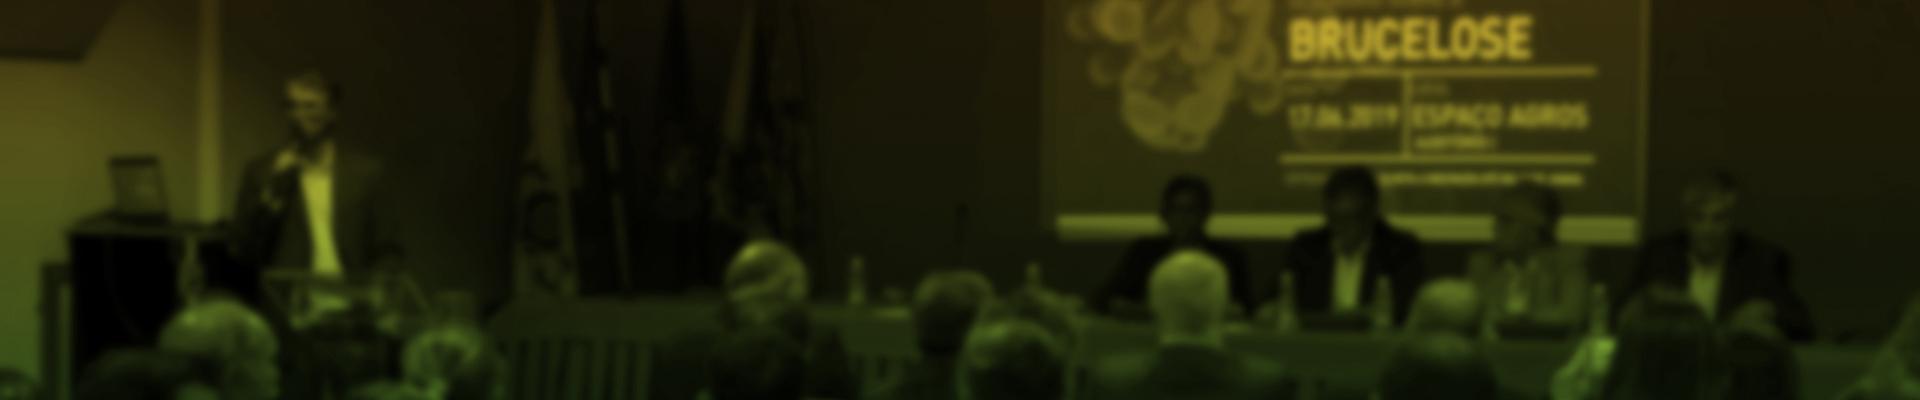 banner seminários ucadesa